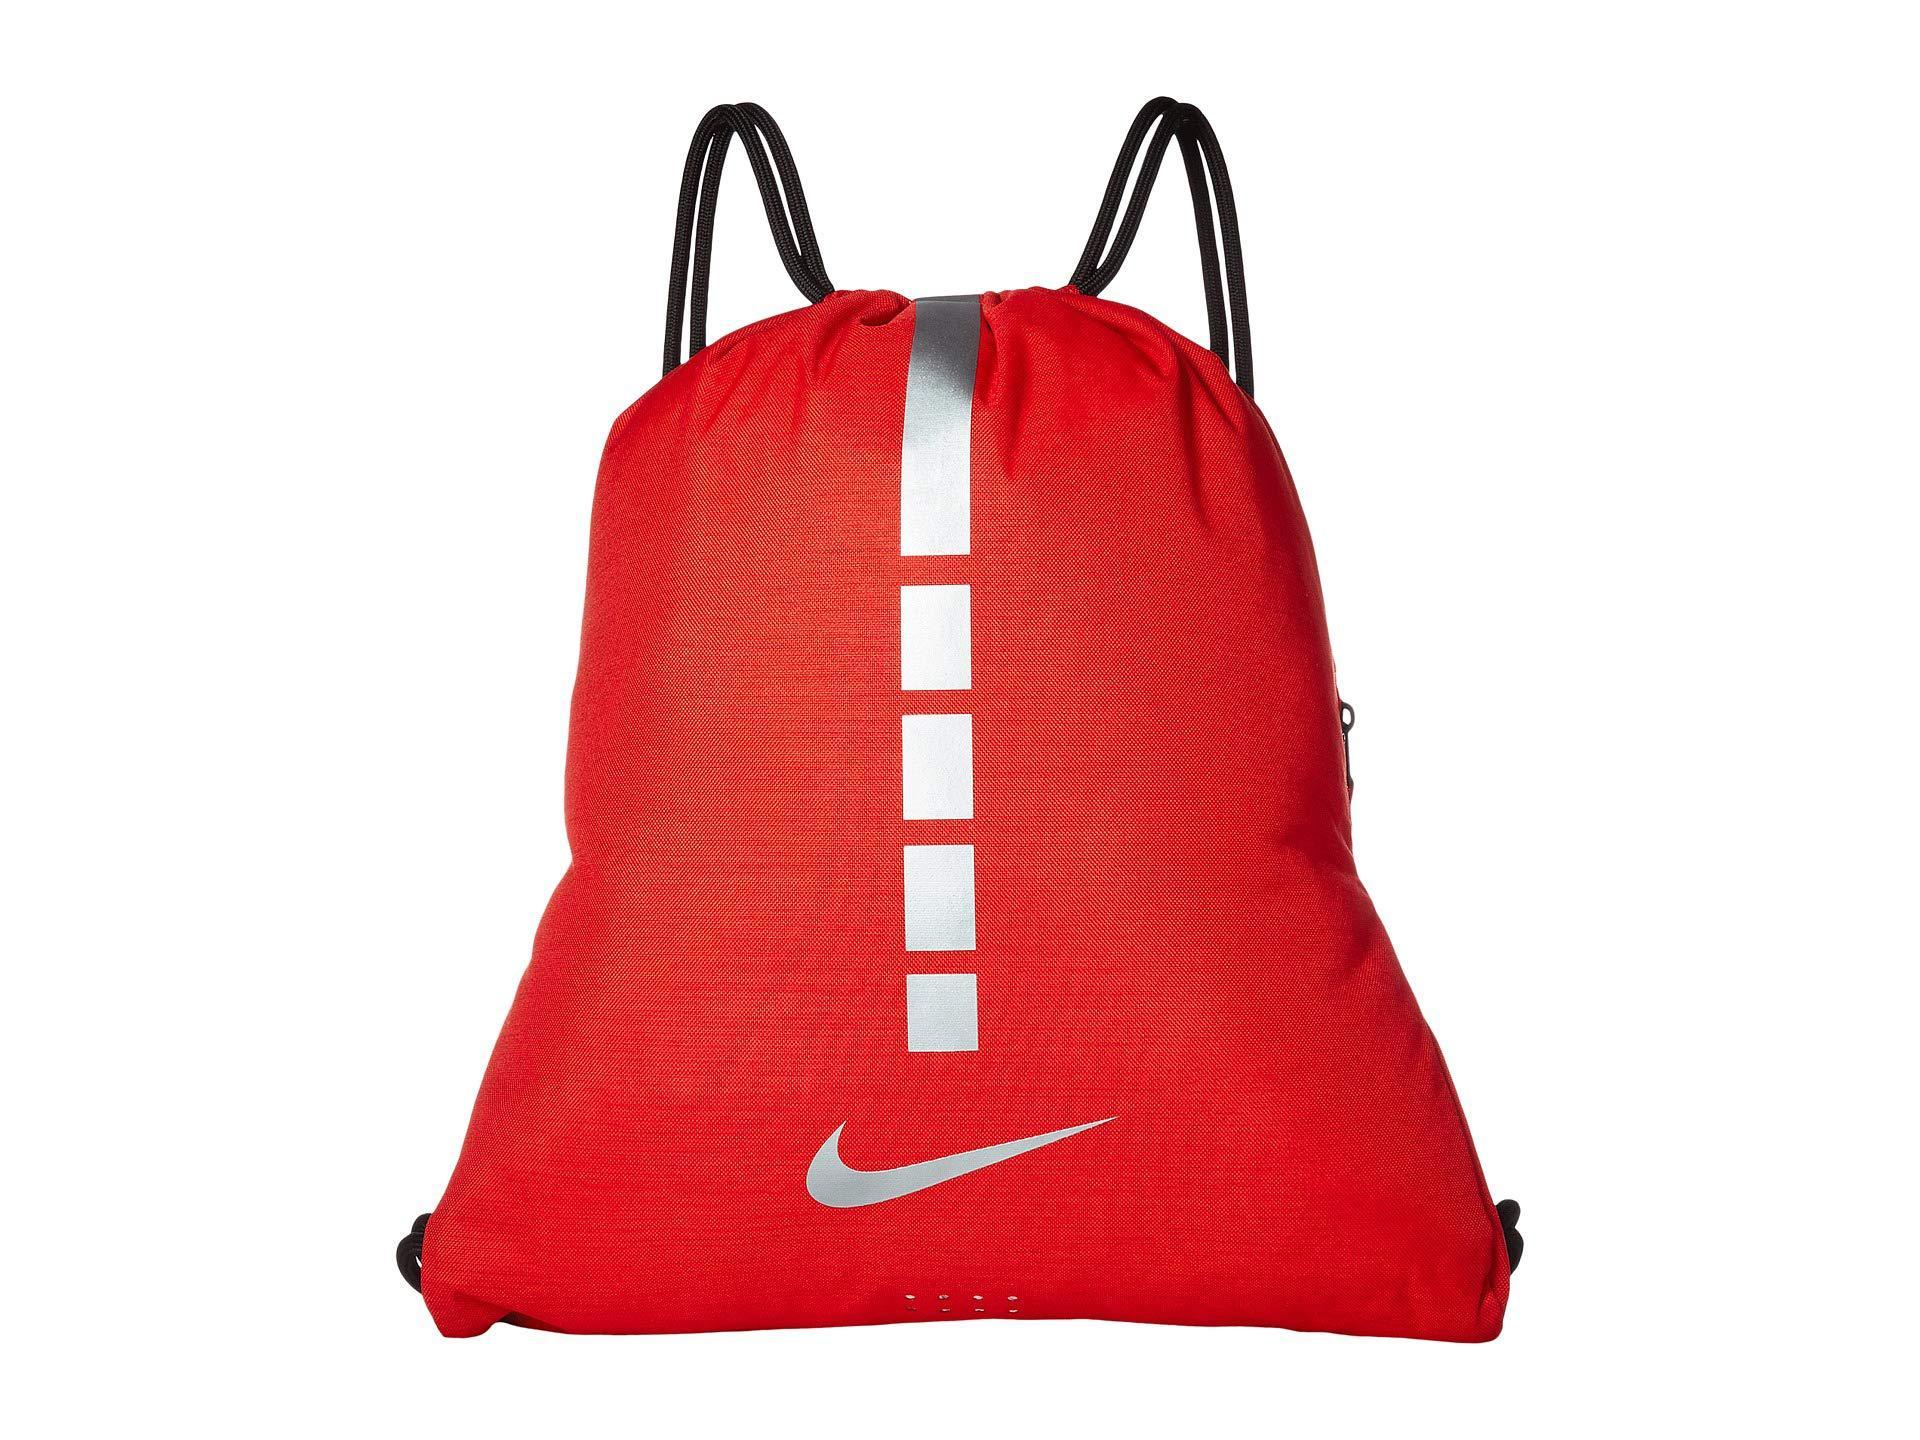 b8546ba1091d Lyst - Nike Hoops Elite Gymsack - 2.0 (university Red black metallic ...